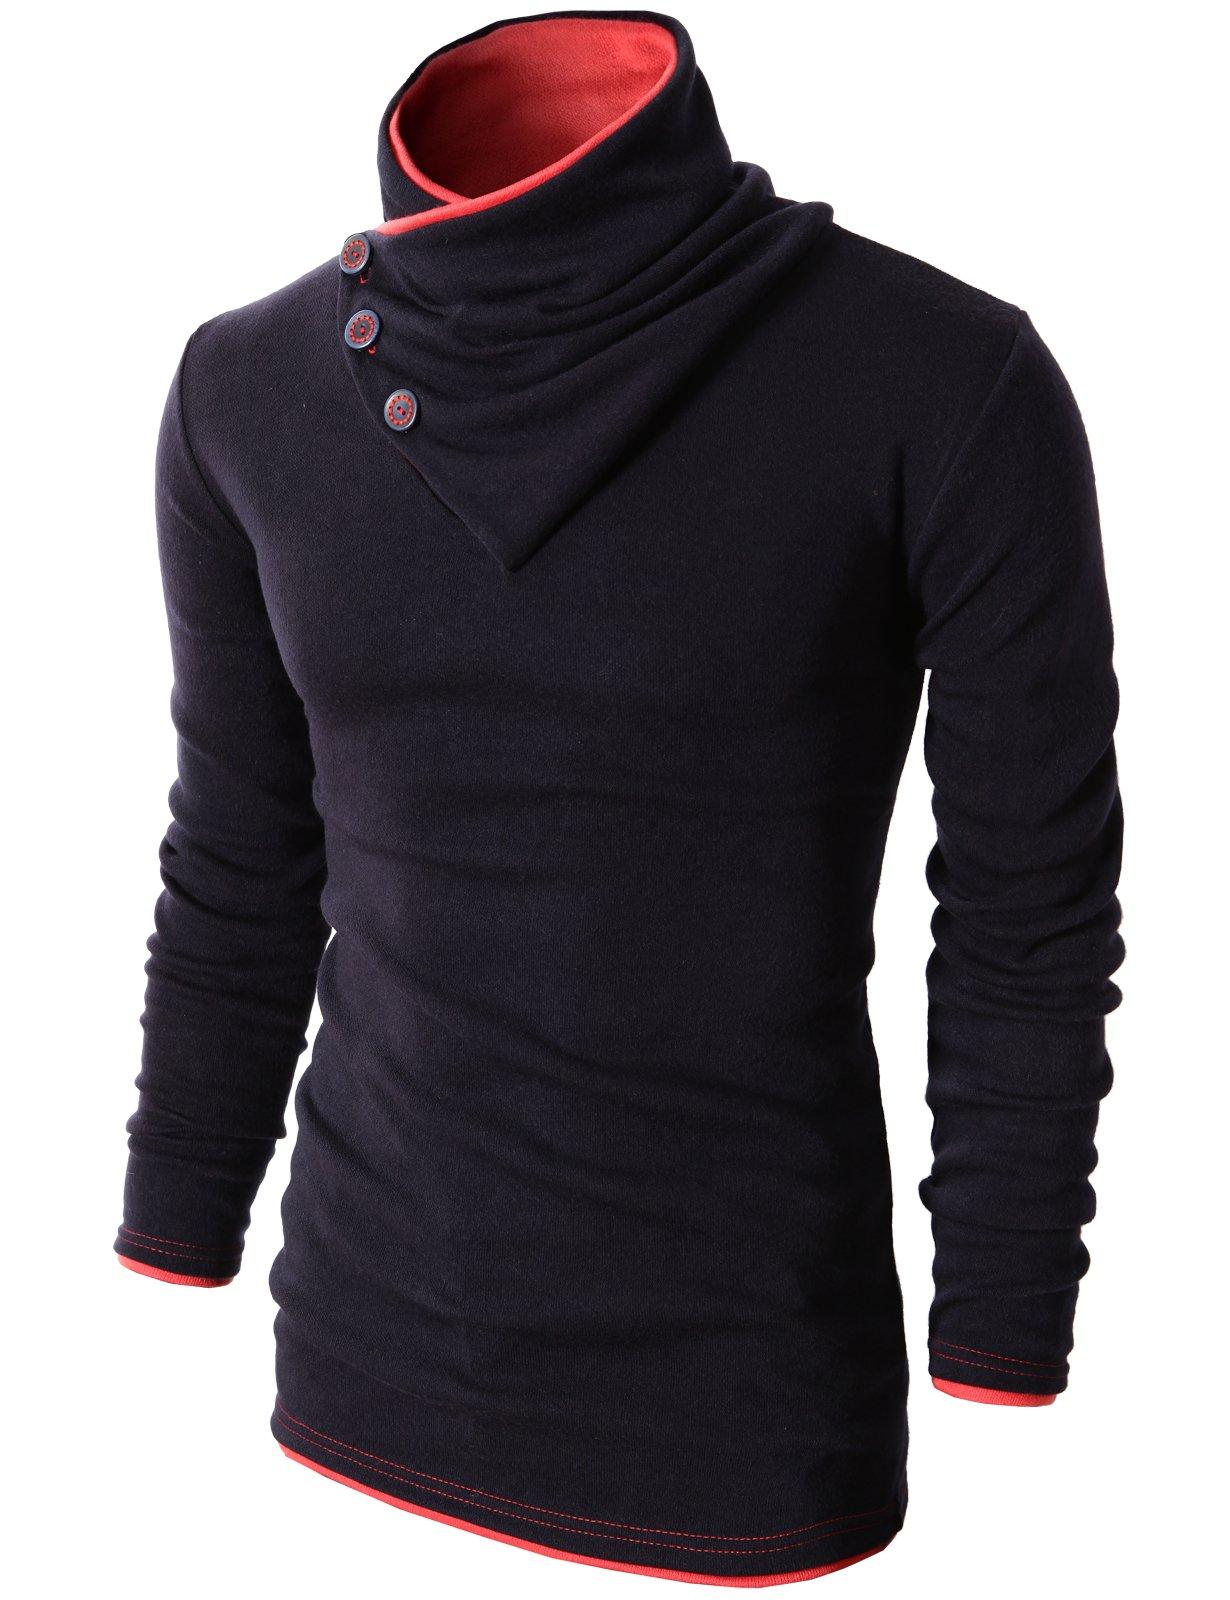 H2H Mens Fashion Turtleneck Slim Fit Pullover Sweater Oblique Line Bottom Edge NAVY US M/Asia L (KMTTL040)